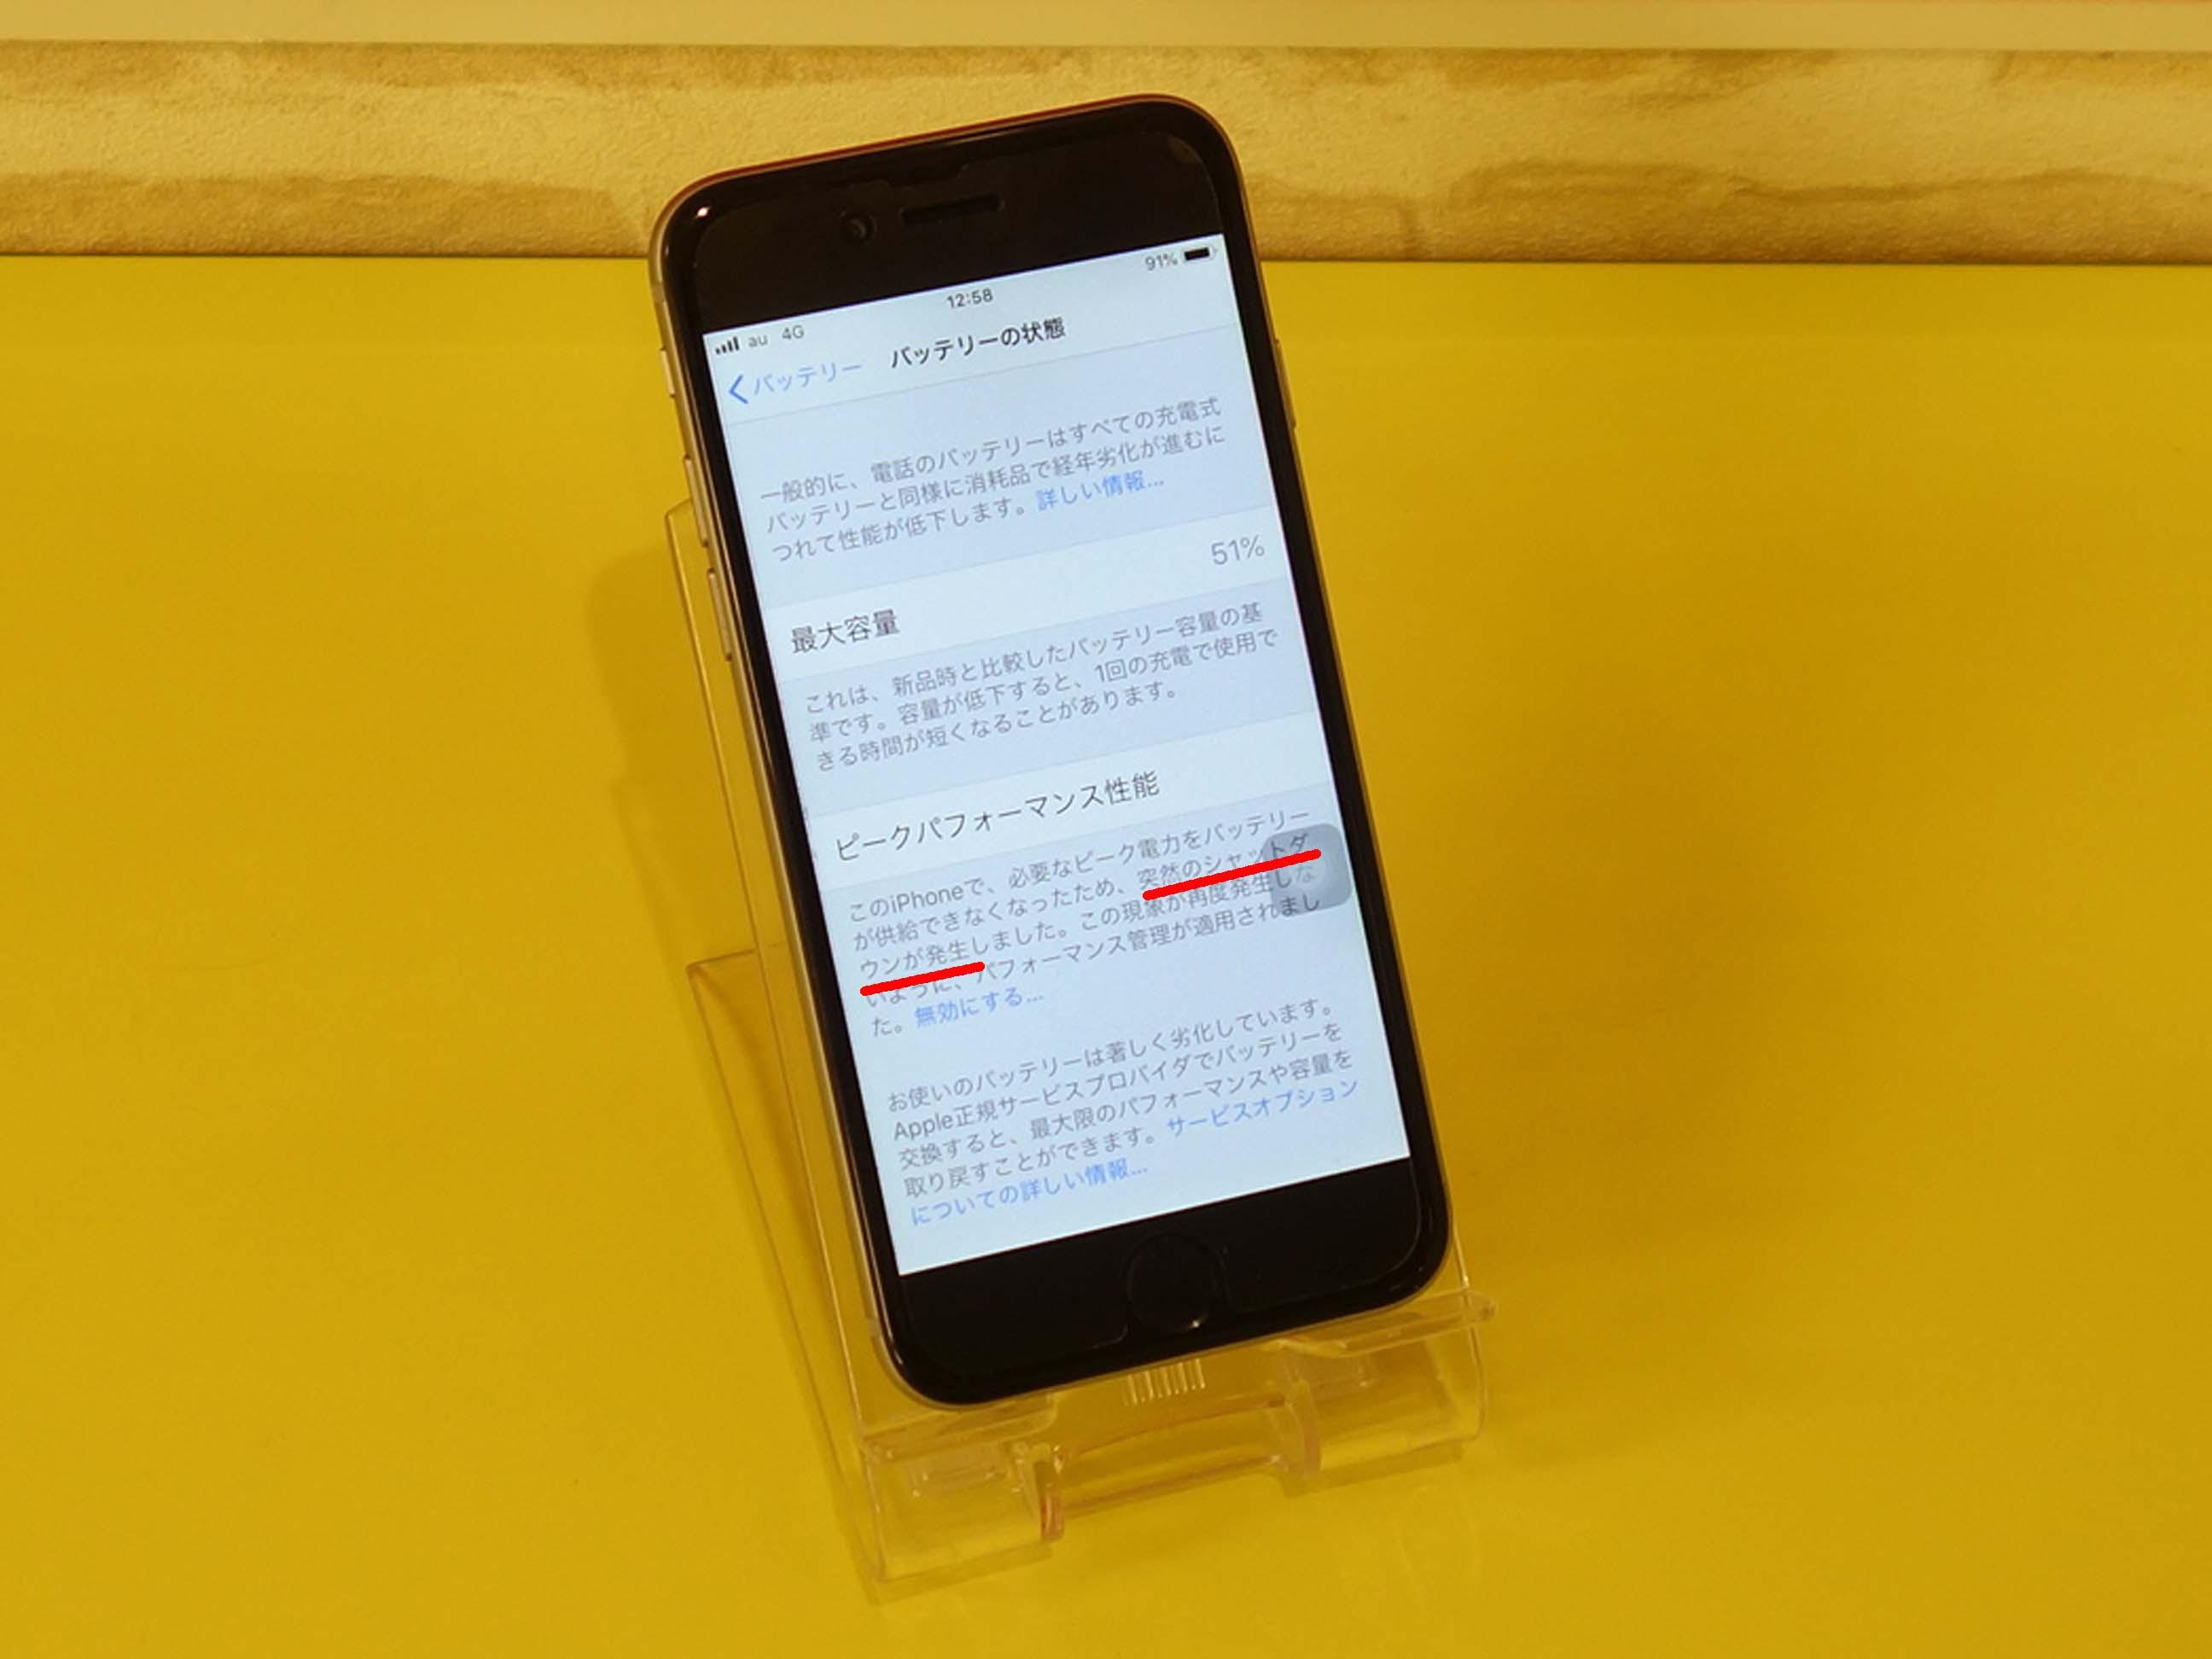 iPhone6のバッテリー交換修理で清須市からご来店!アイフォン修理のクイック名古屋